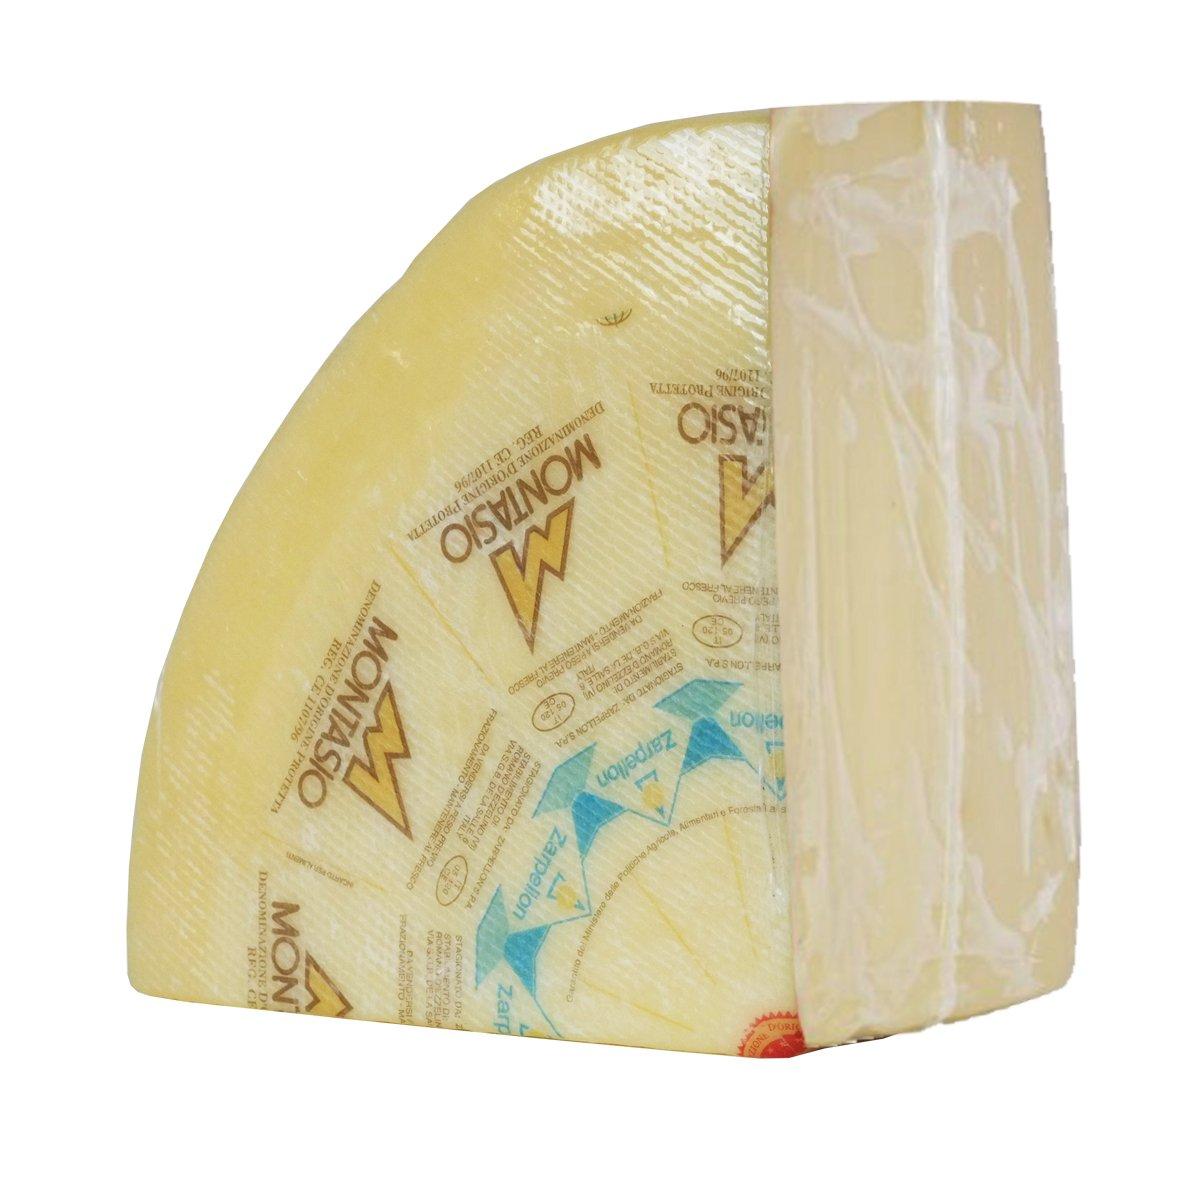 Montasio Italian Cheese D.O.P. - 3.5 lb approx.